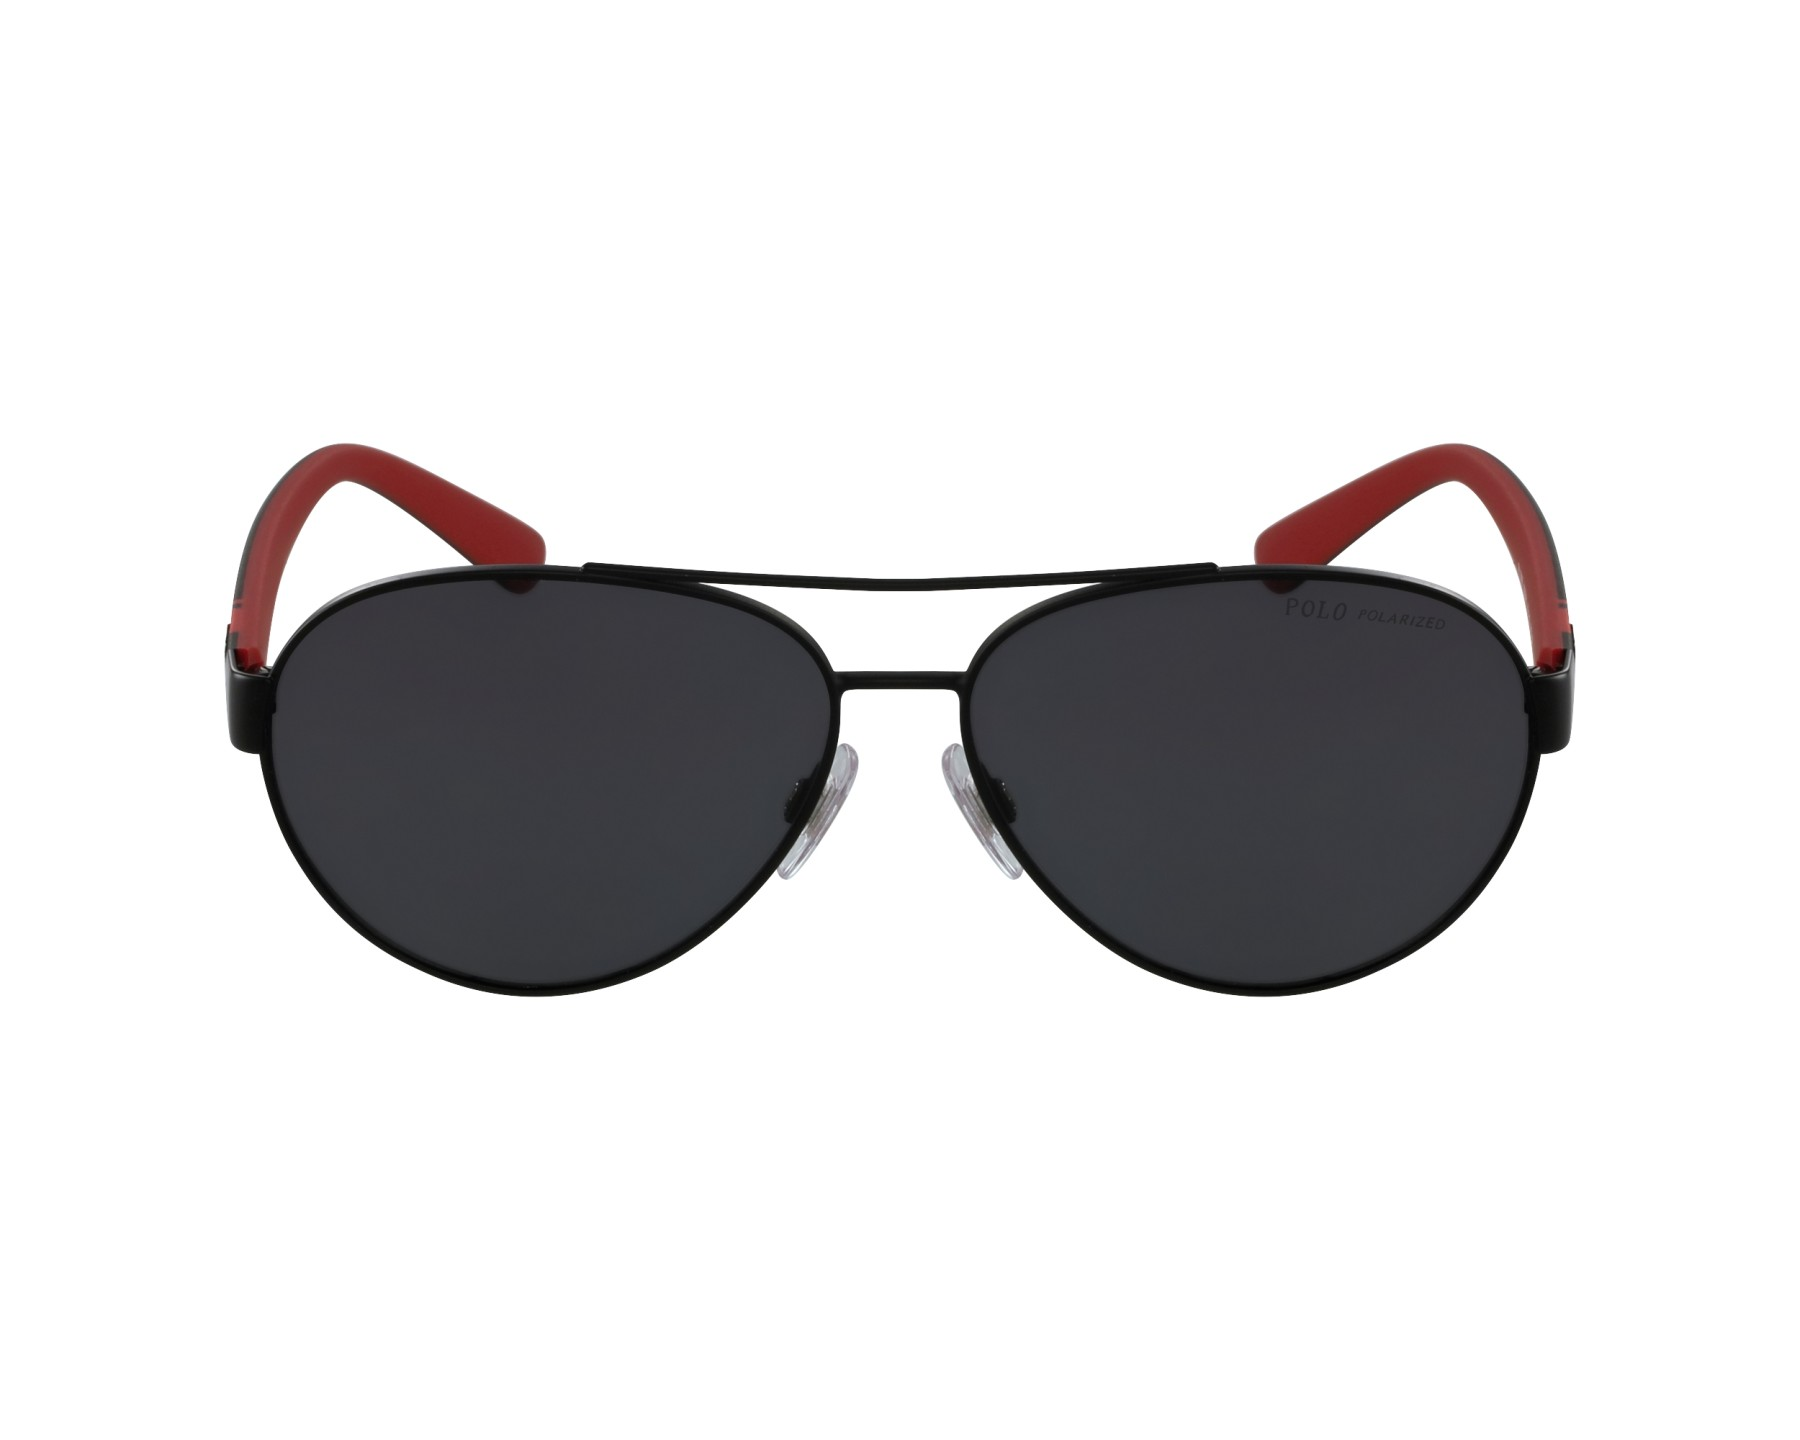 a77b3ee1d34 Sunglasses Polo Ralph Lauren PH-3098 9230 81 - Black profile view